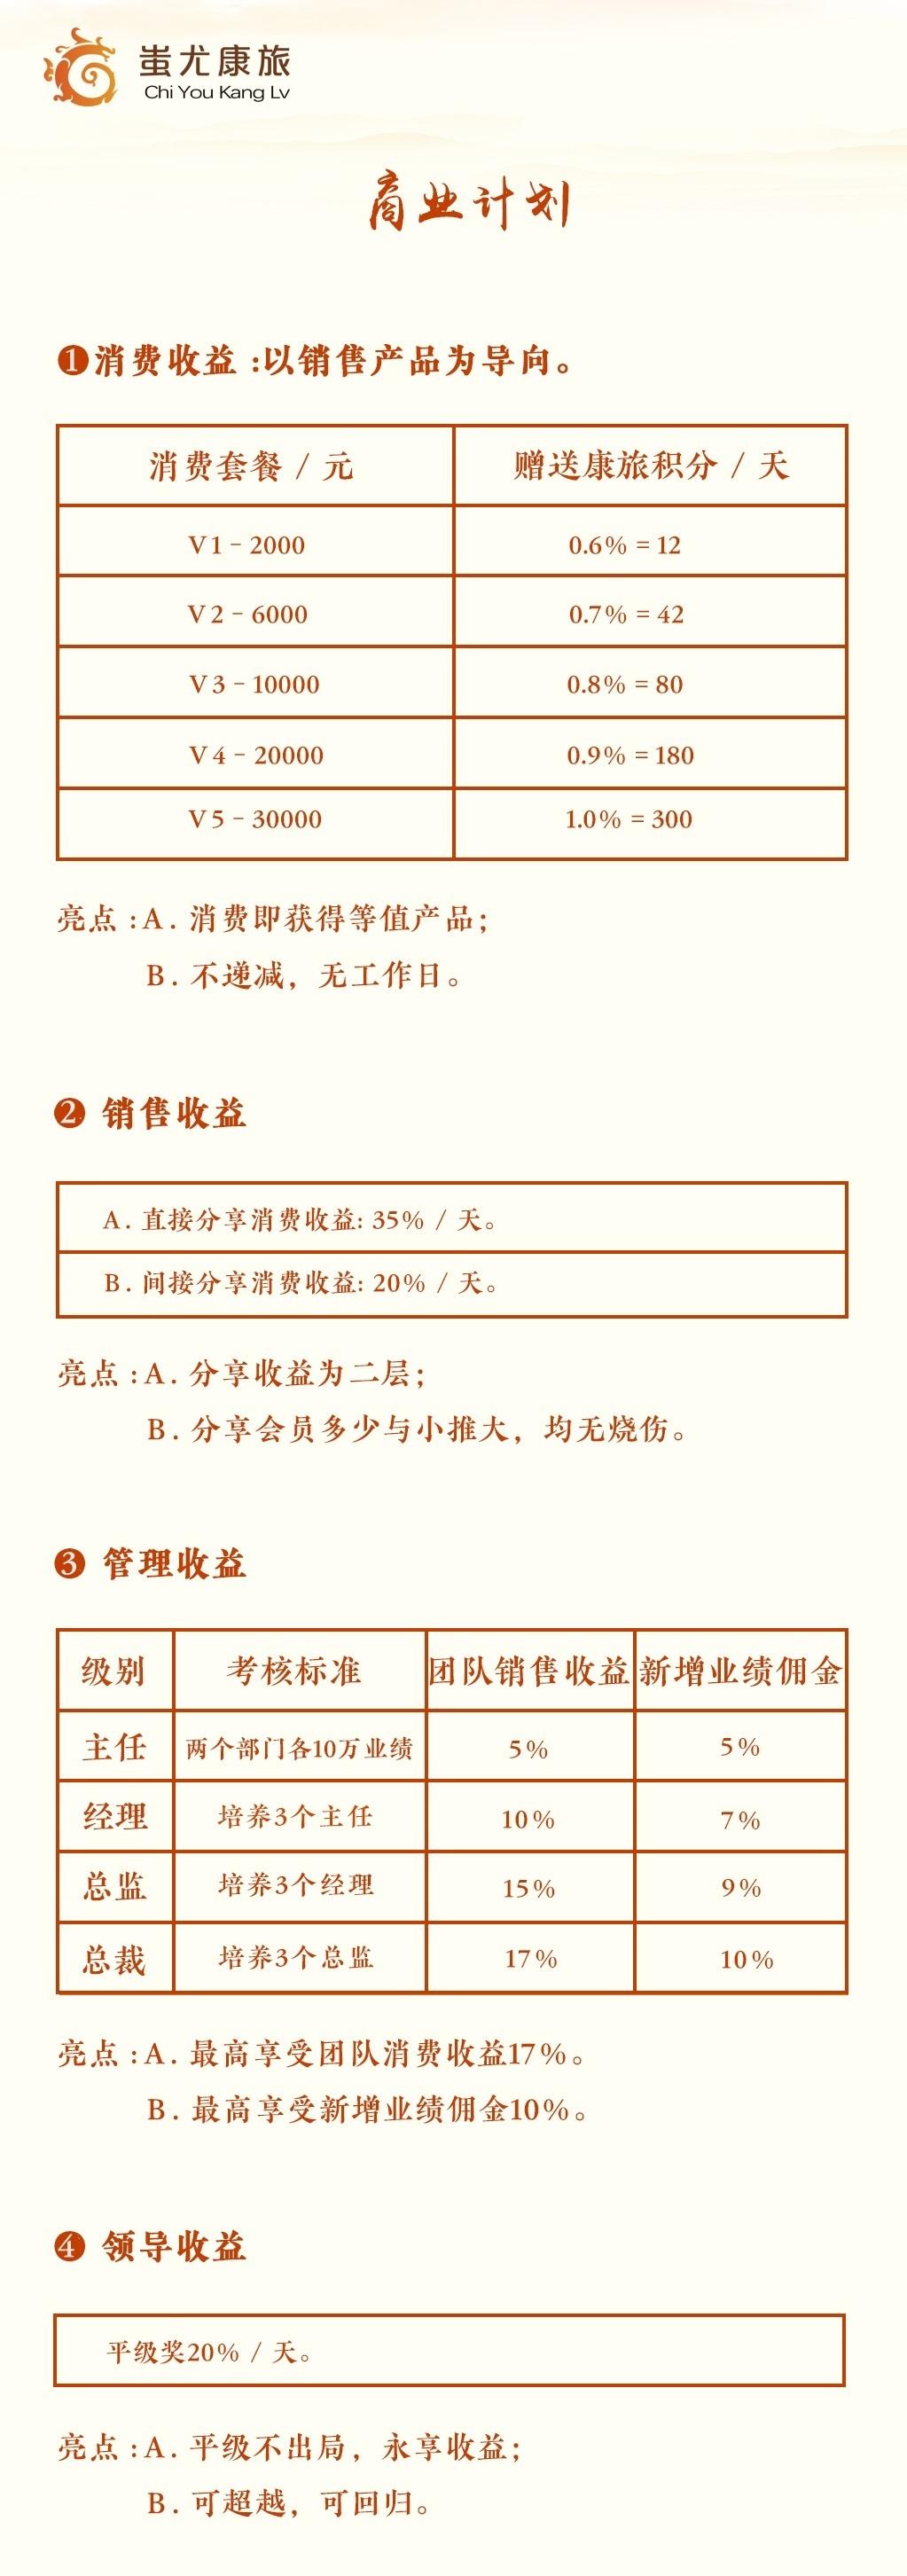 蚩尤康旅:投3万每天返300元 <a href=http://www.zhuoyue5.com/tags/dongshichang/ >董事长</a>被指关系硬